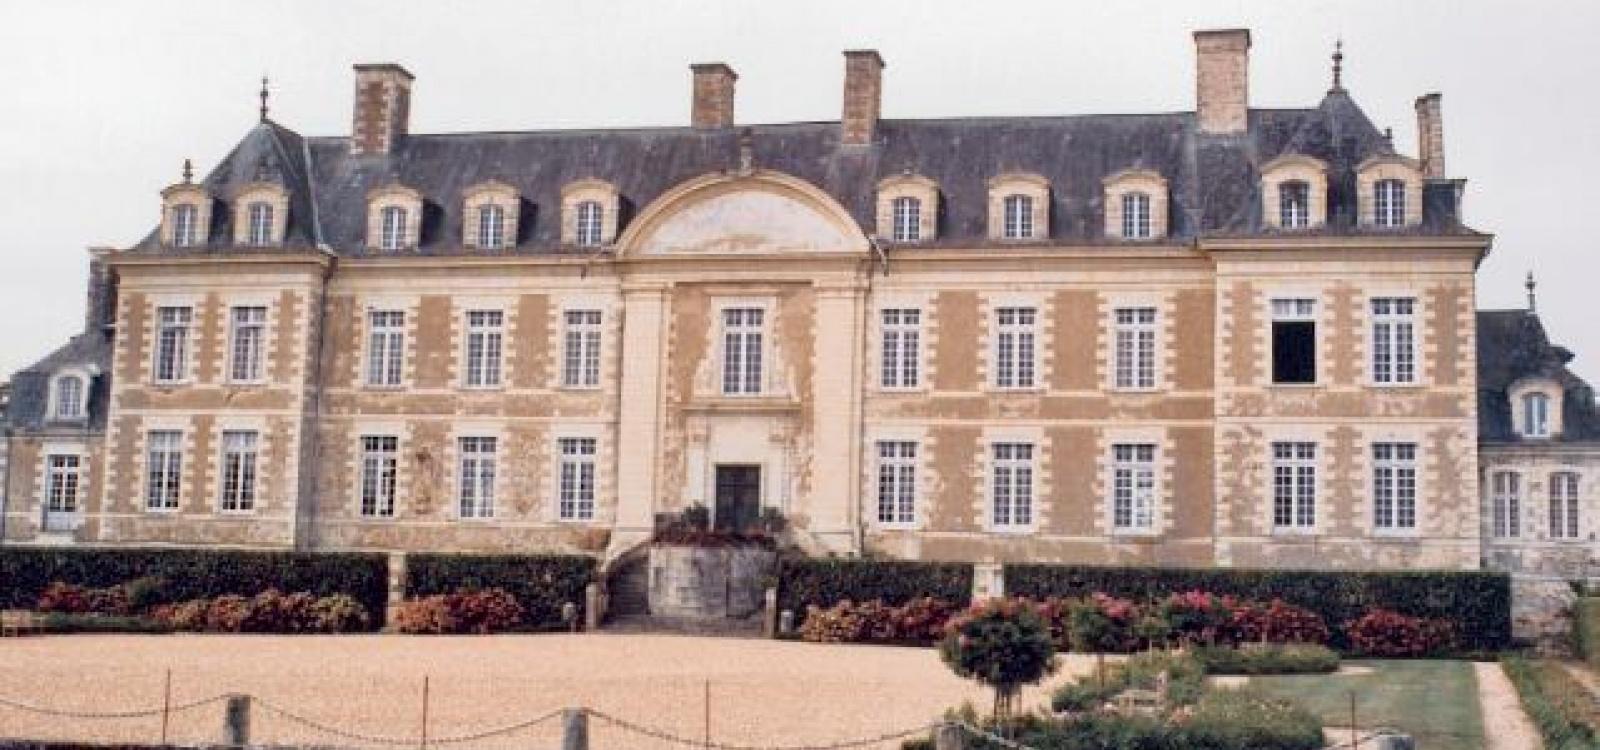 Chateau-Gonthier,Mayenne,France,Château,1066